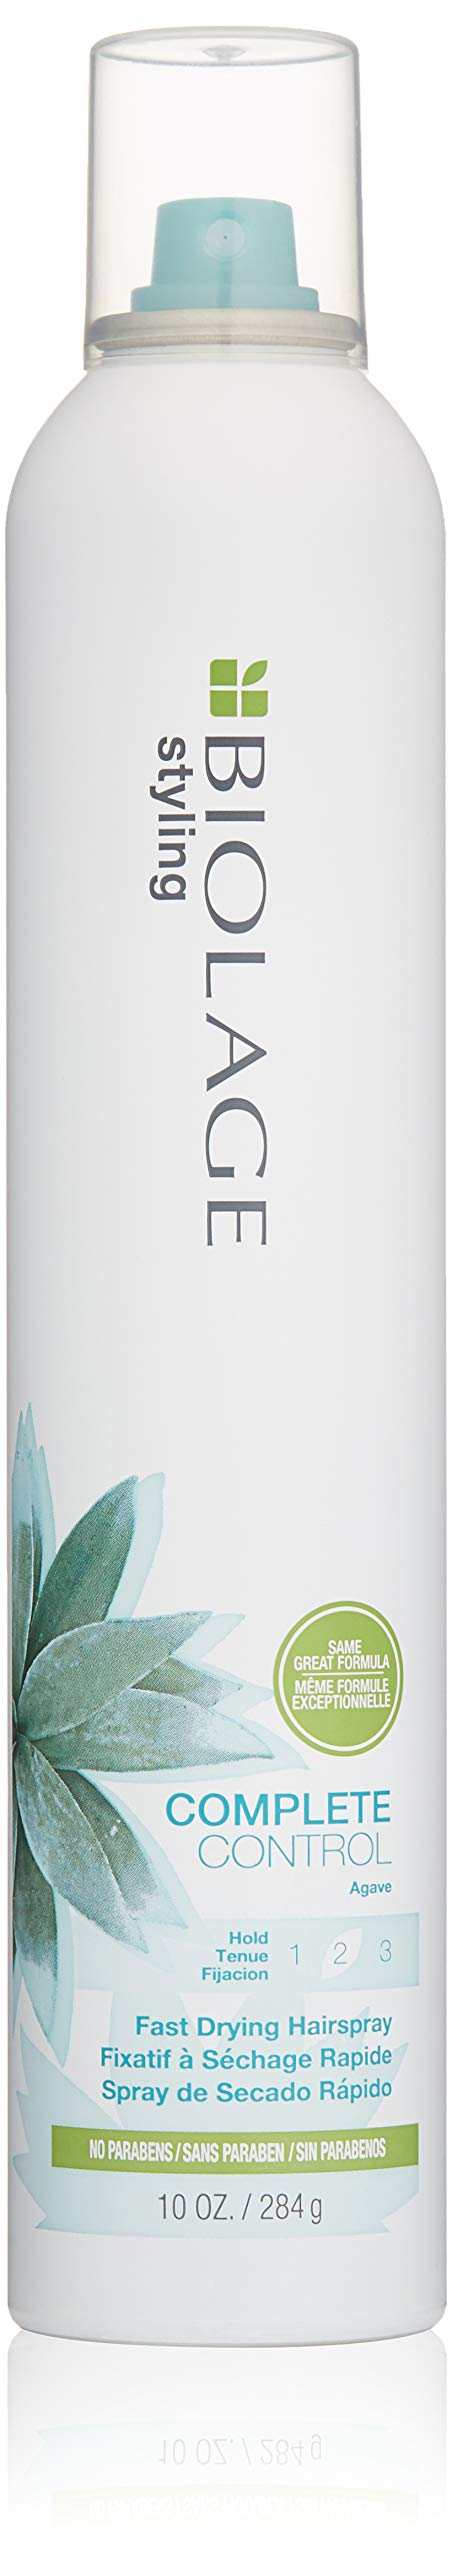 Biolage Styling Complete Control Hairspray, 10 oz. by BIOLAGE